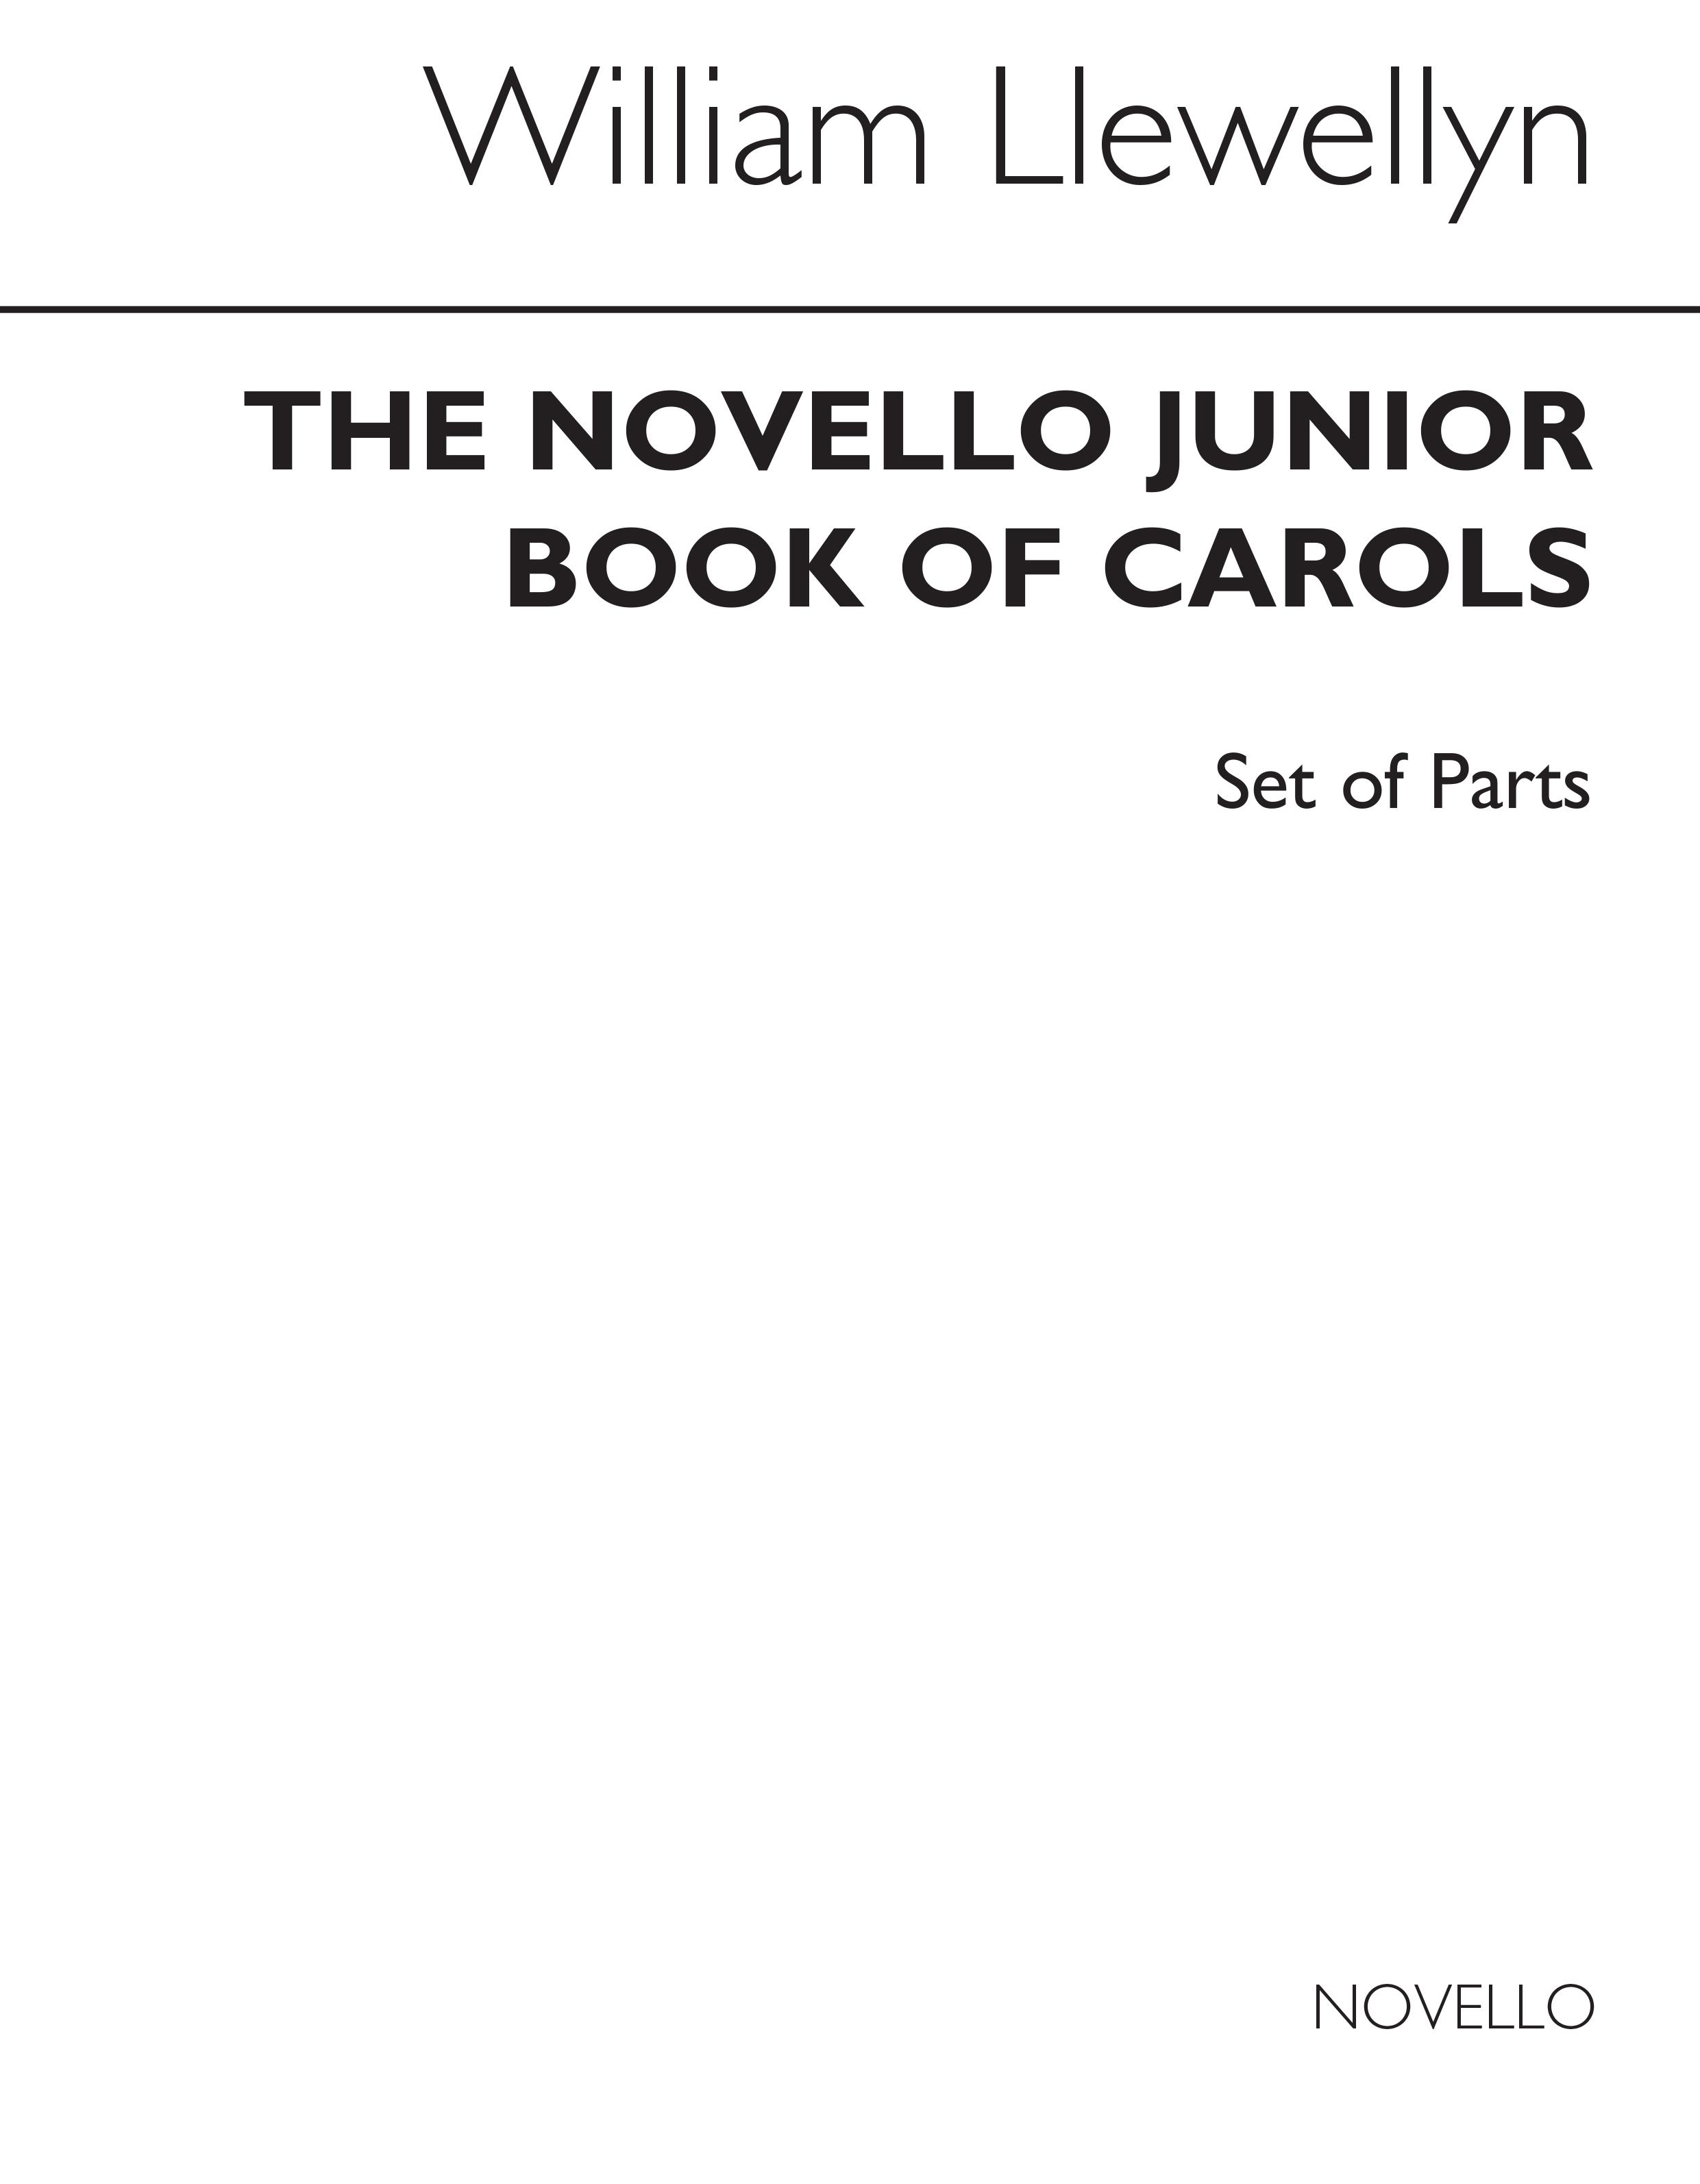 The Novello Junior Book Of Carols Part 1: Upper Voices: Vocal Score